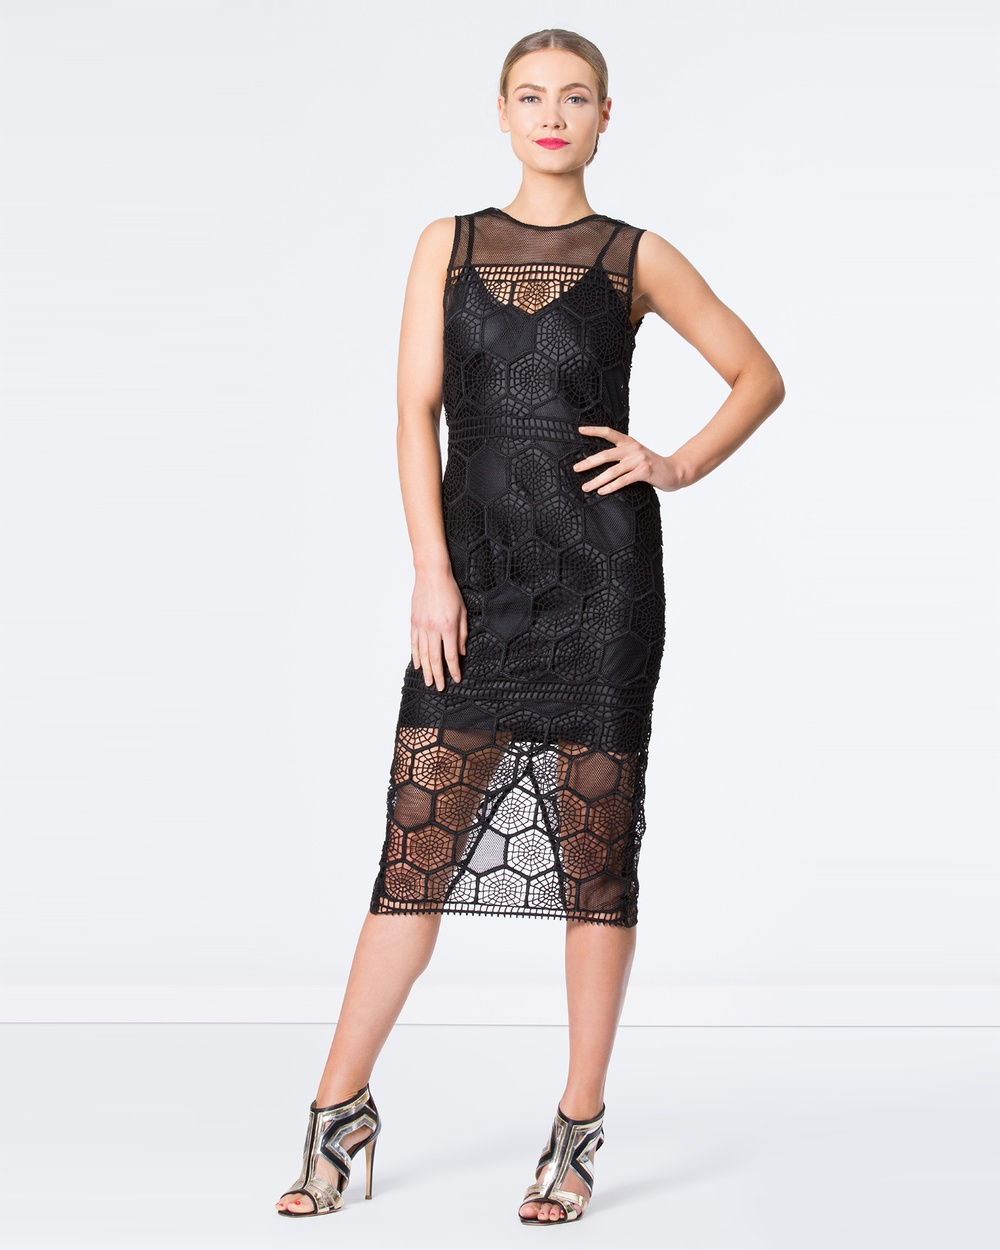 SIYONA Honeycomb Mesh Dress Dresses Black Honeycomb Mesh Dress